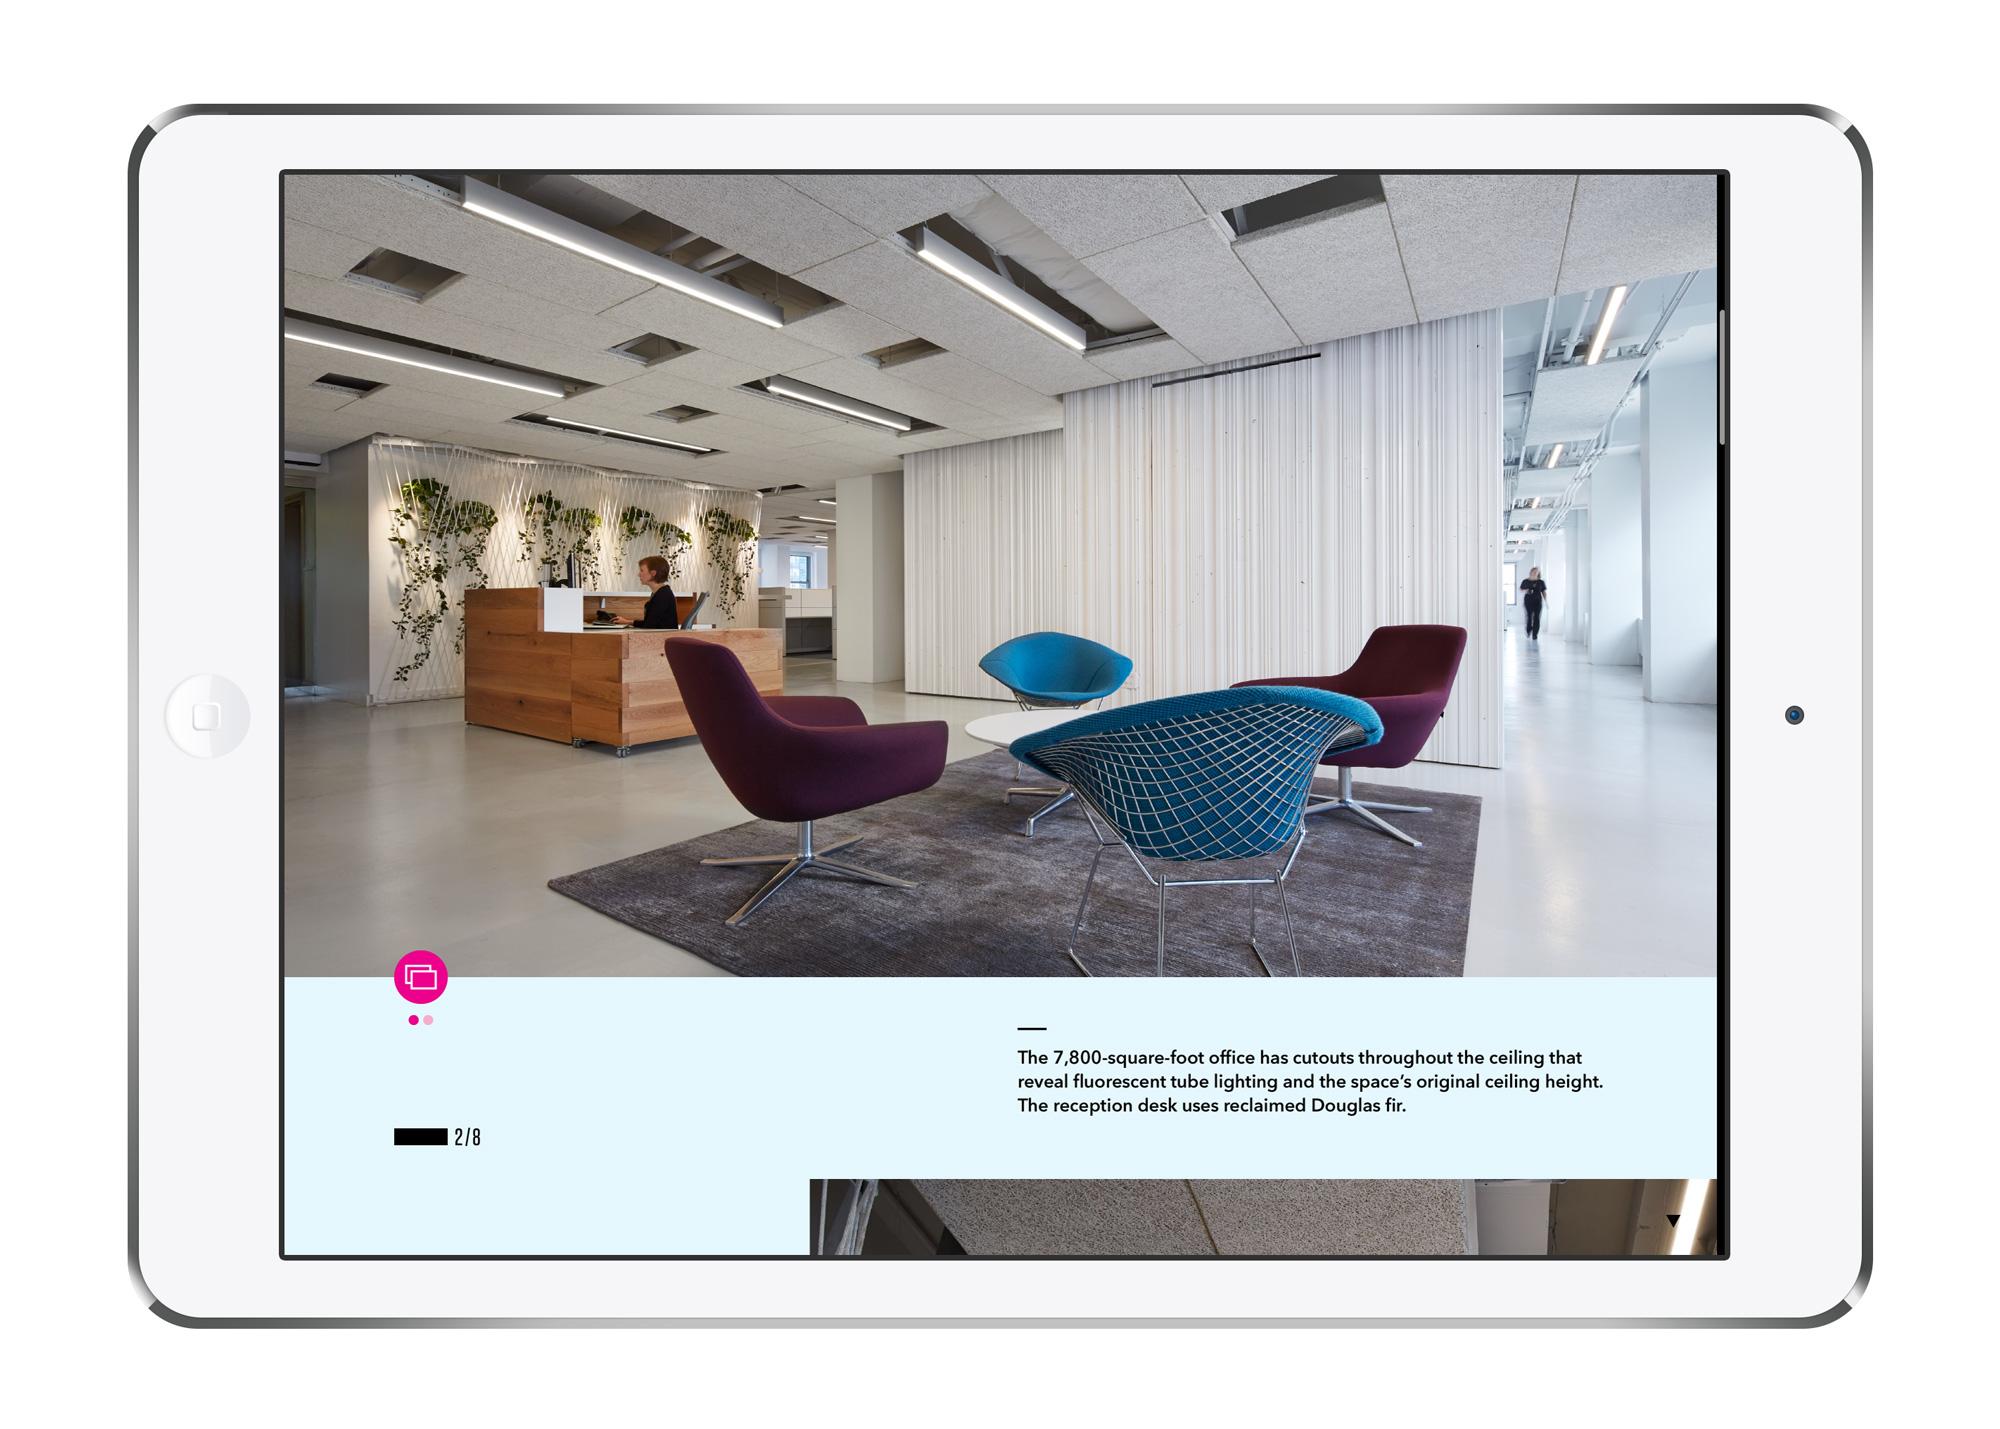 GBD_iPad_Feature-AIA-3.jpg